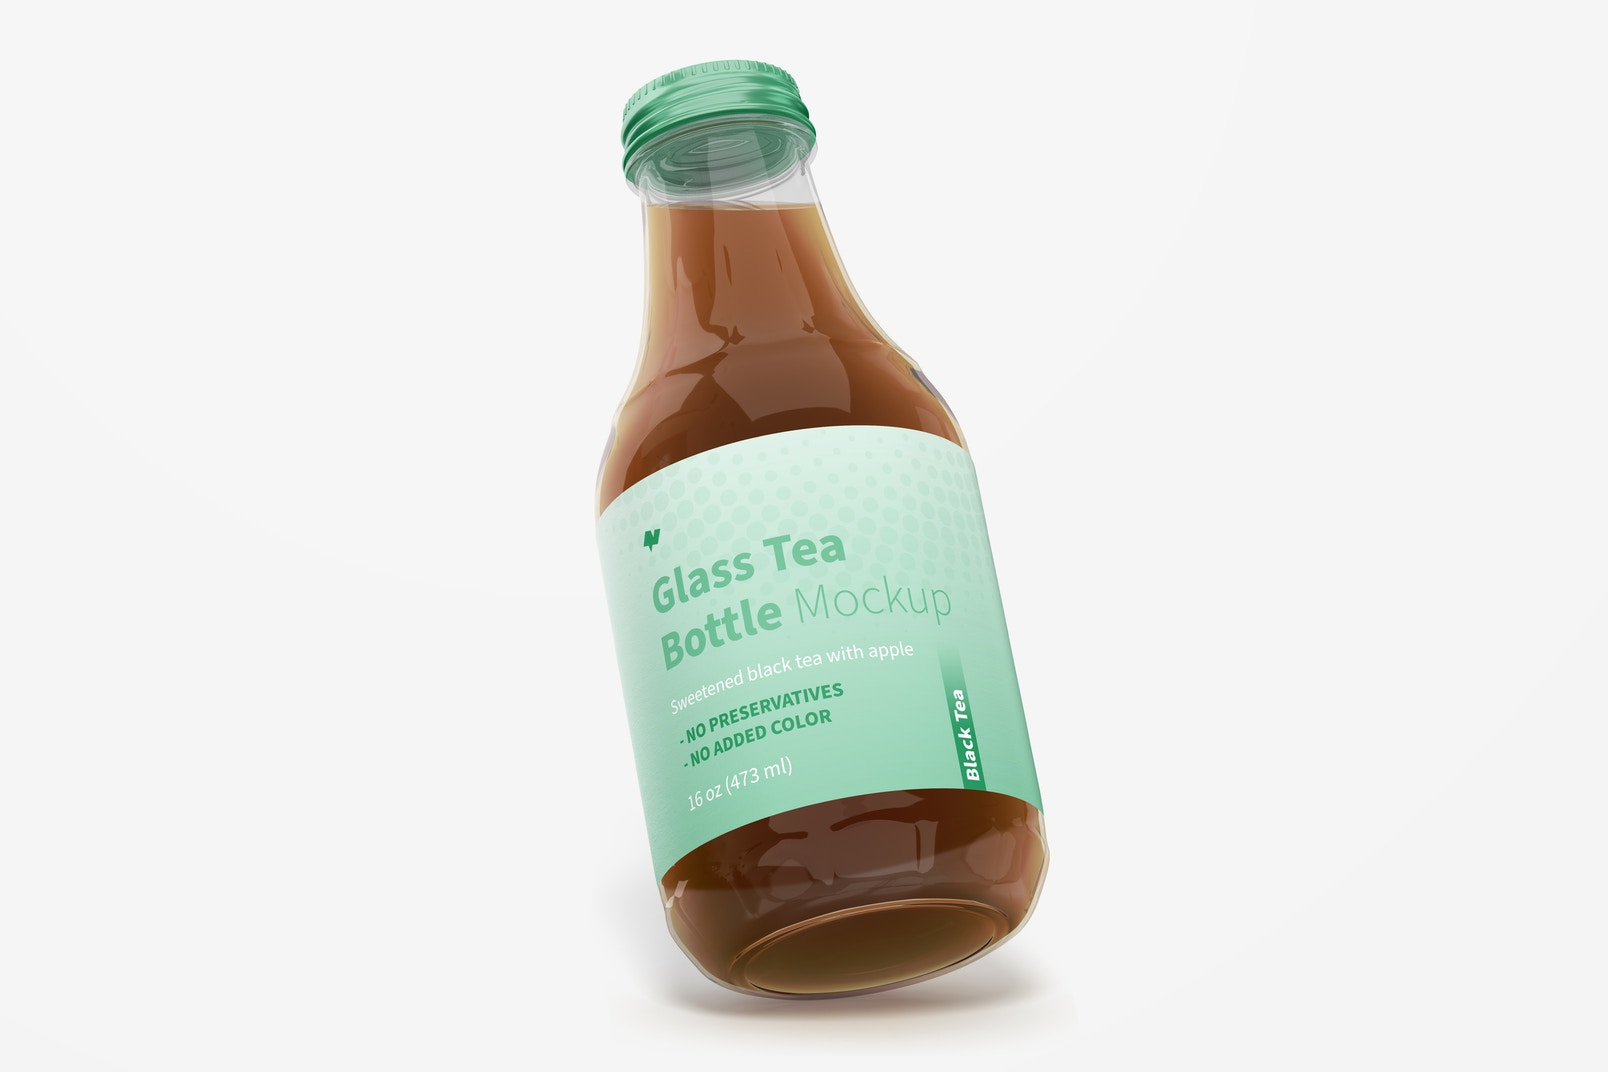 16 oz Glass Tea Bottle Mockup, Leaned